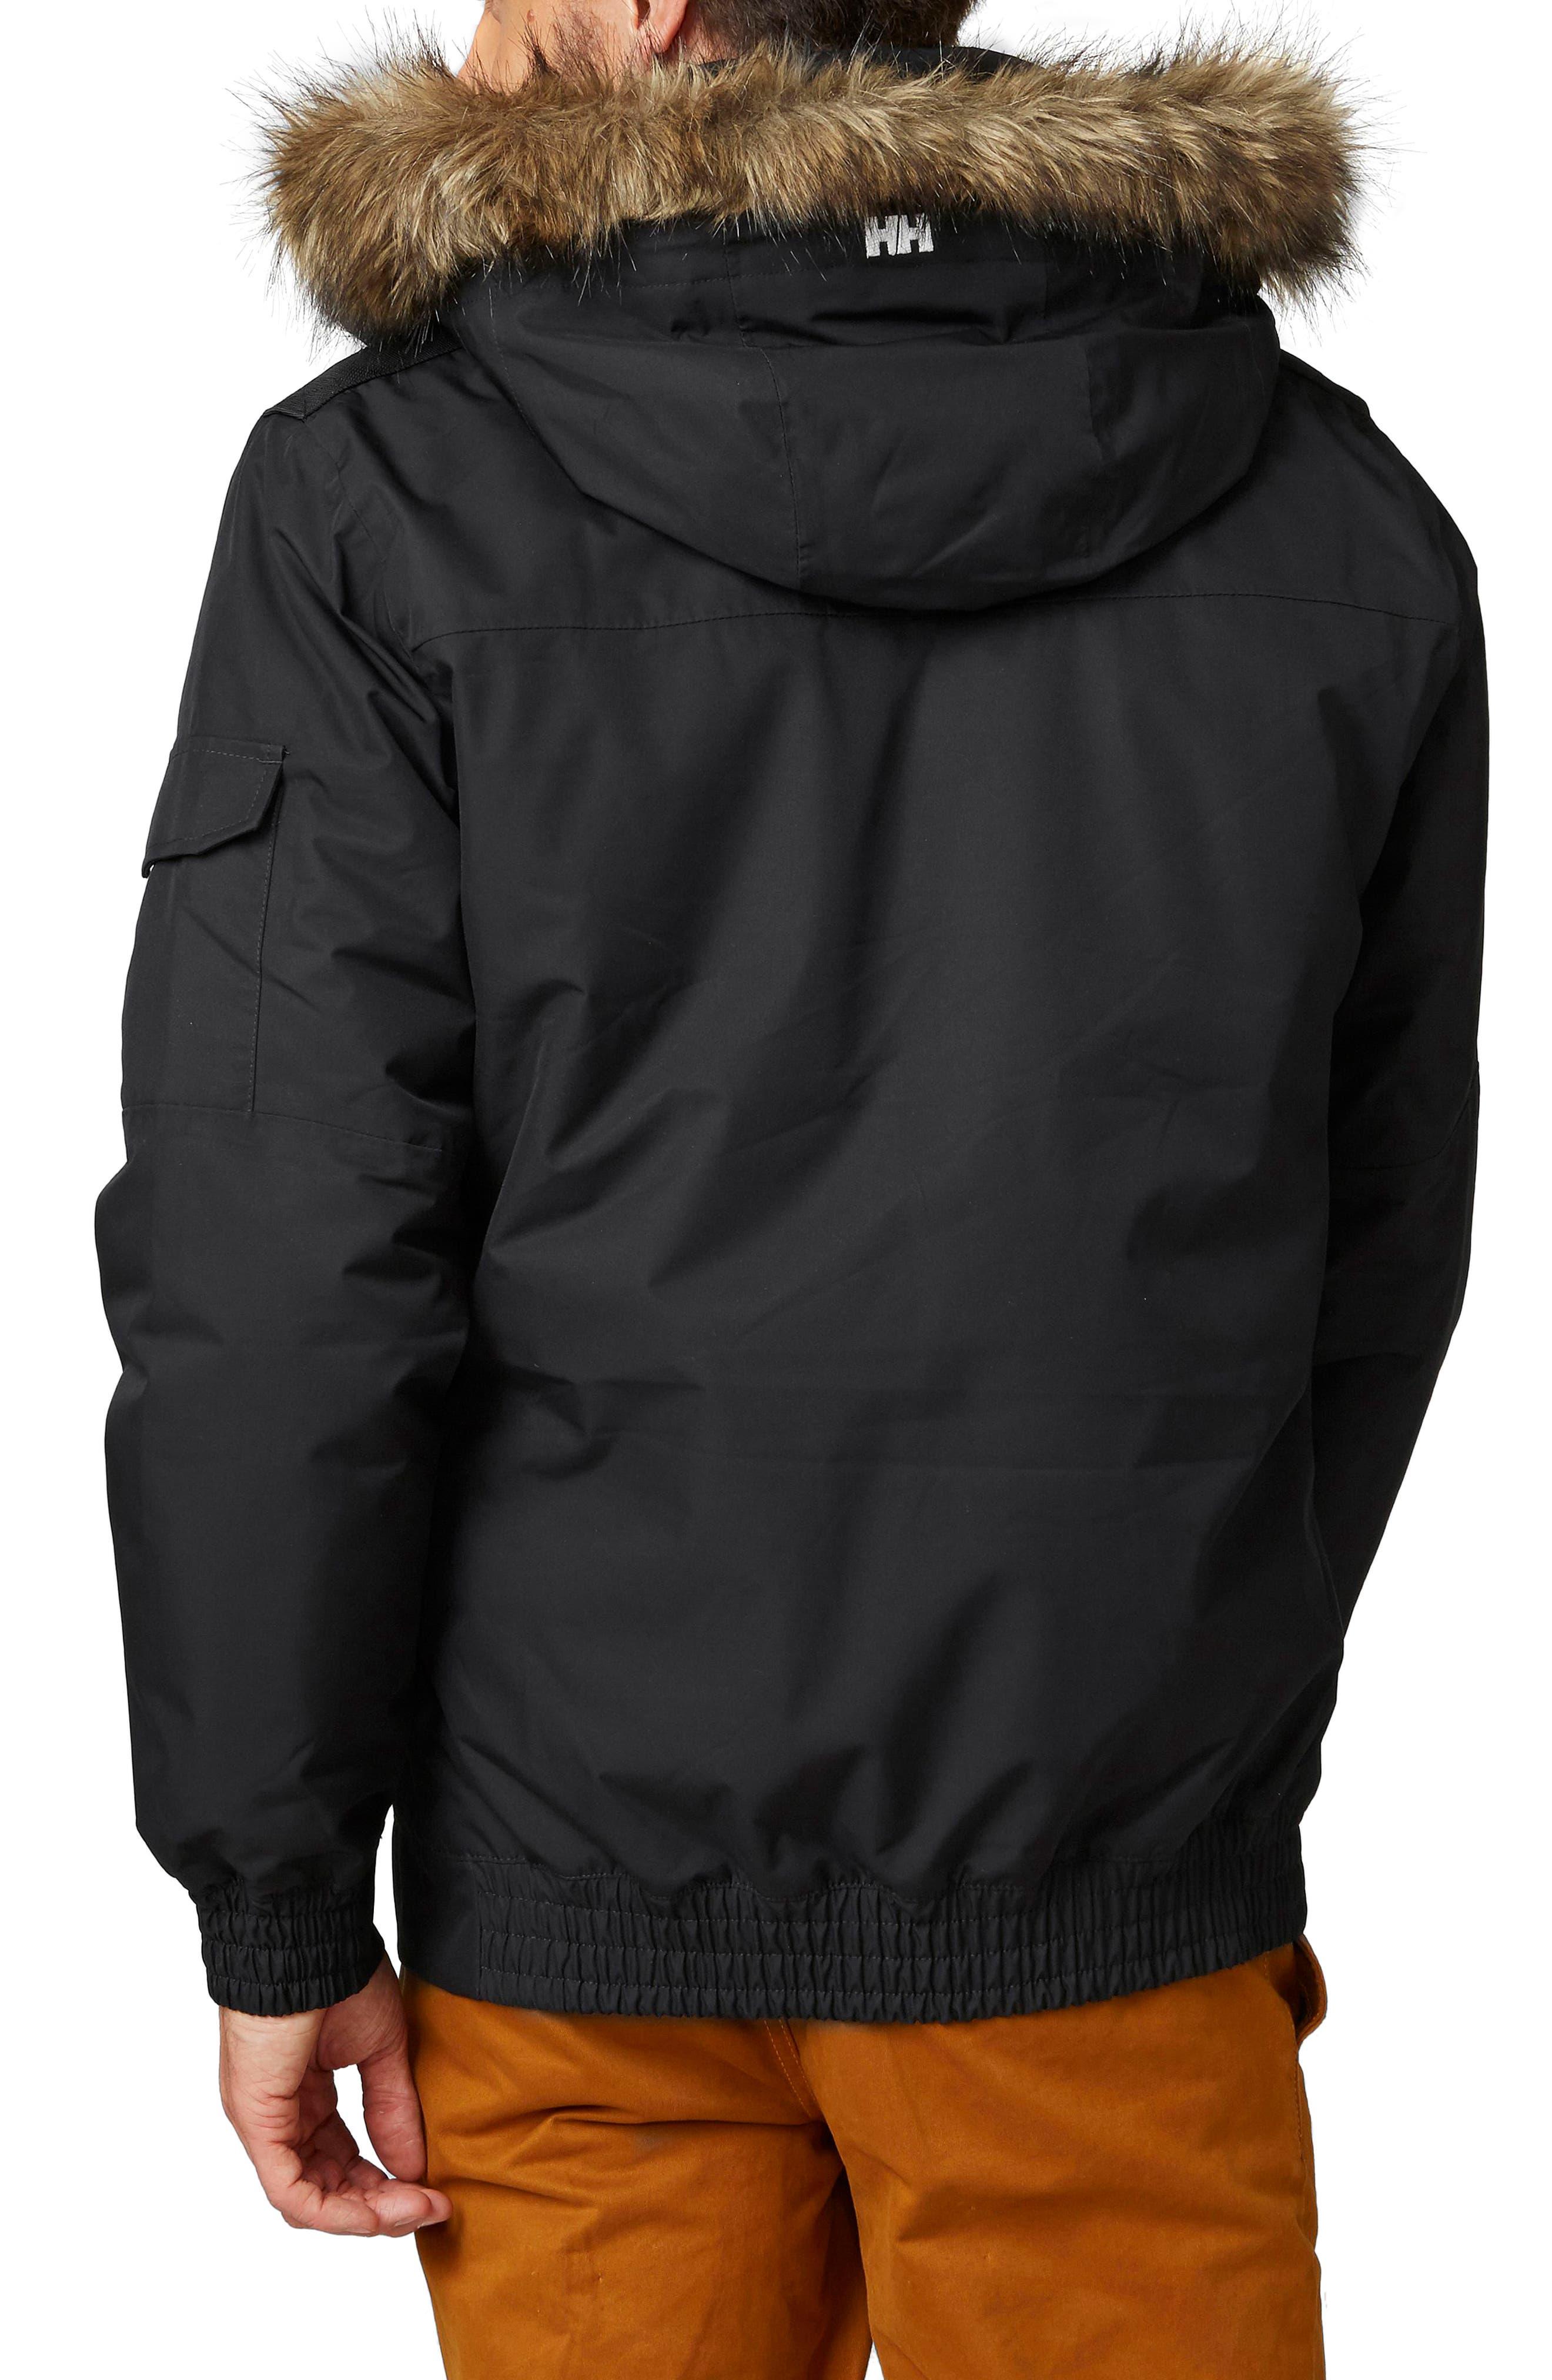 Dubliner Waterproof Down Jacket,                             Alternate thumbnail 2, color,                             001